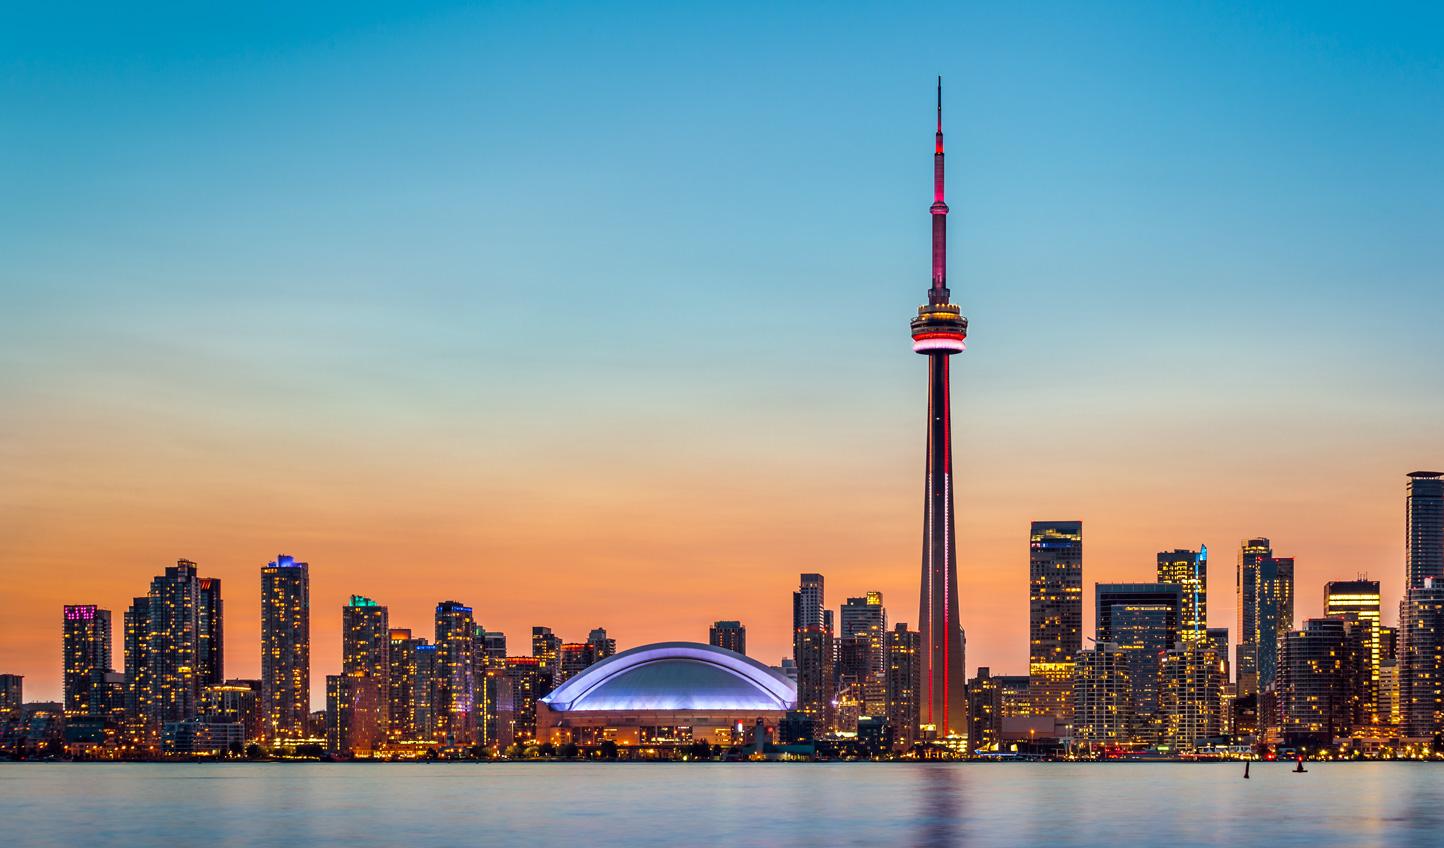 The Toronto skyline and Lake Ontario at twilight